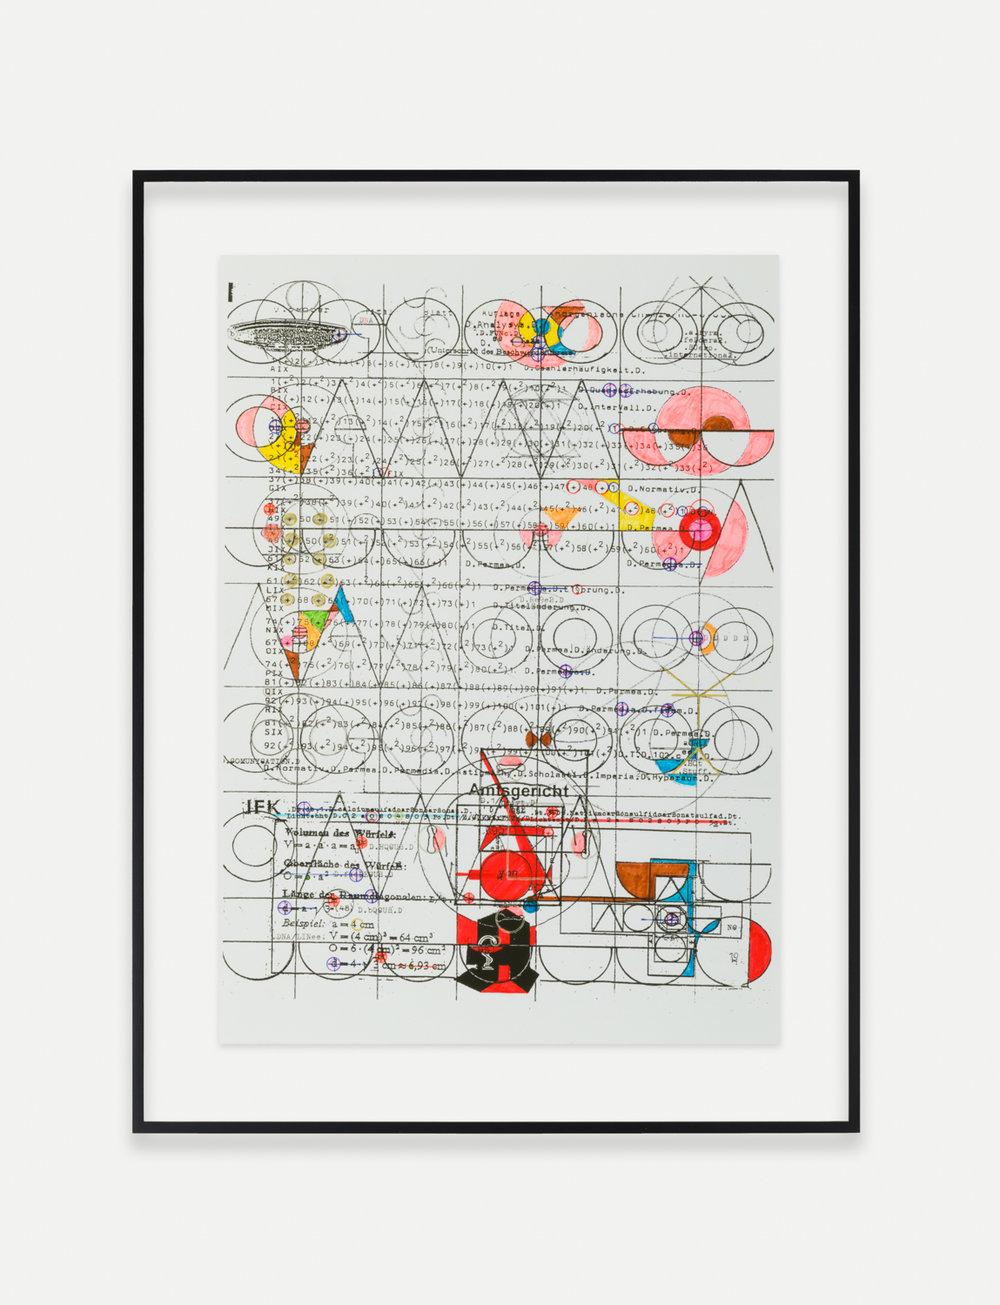 Adelhyd van Bender Untitled 1999-2014 Mixed media on photocopy 16.5 x 11.75 in (41.91h x 29.85w cm) AVB013